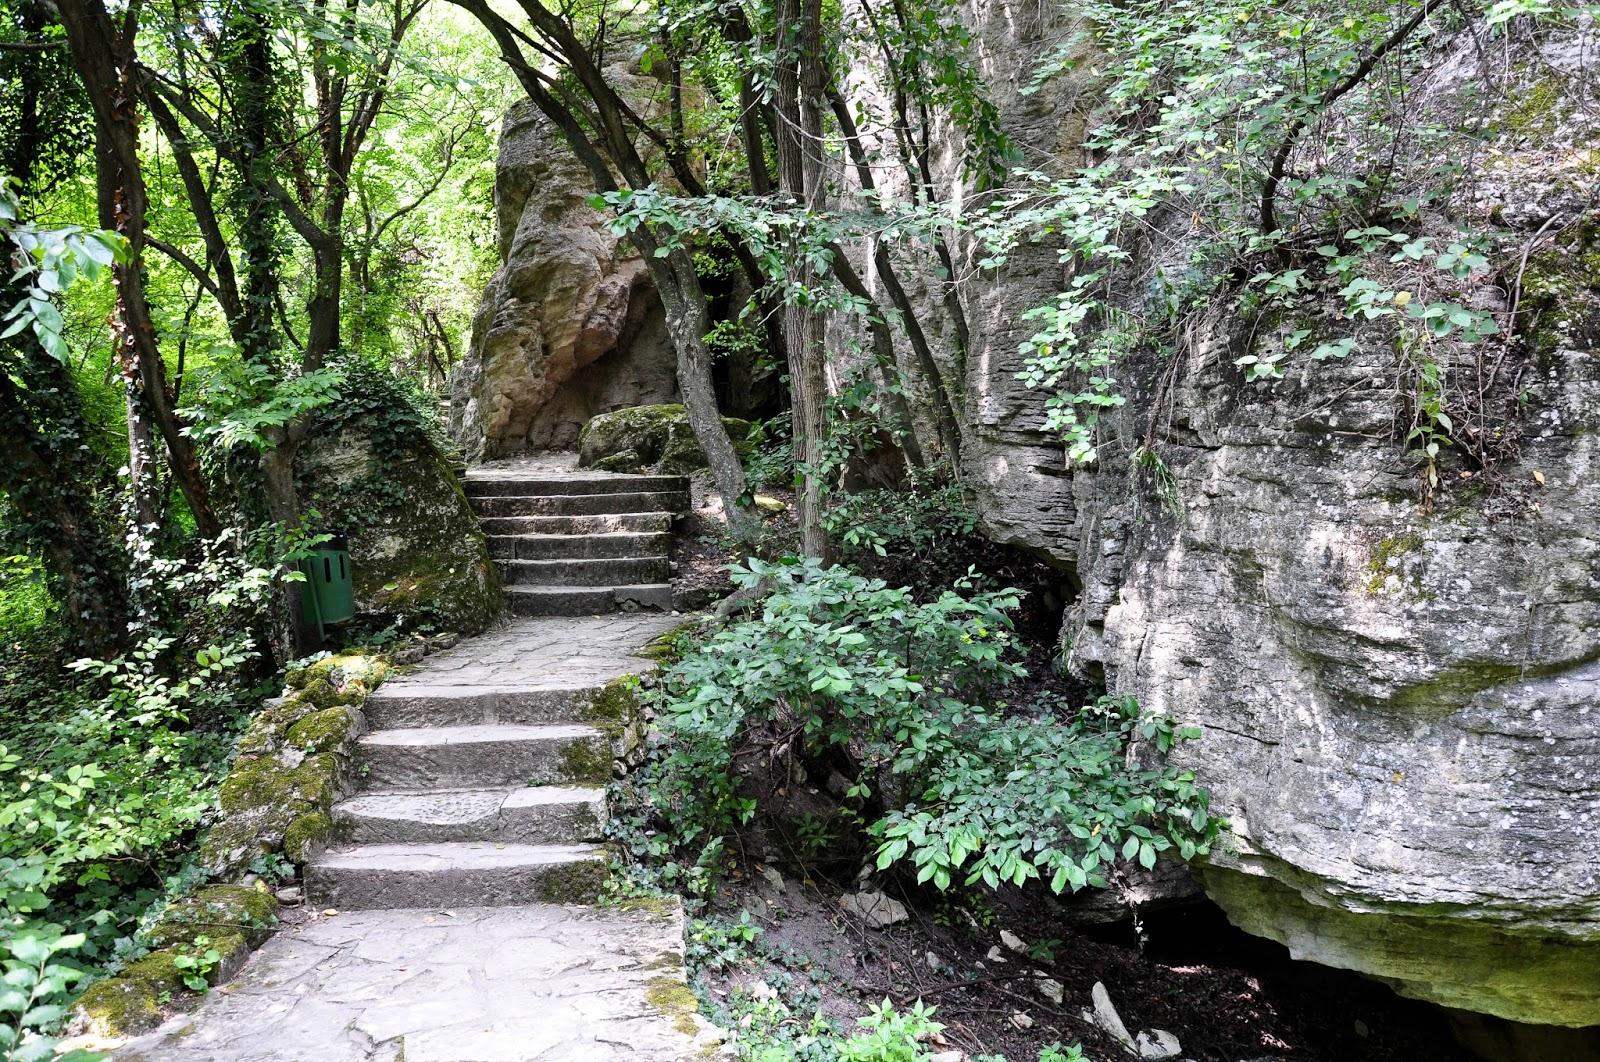 The stone steps, Madara, Bulgaria